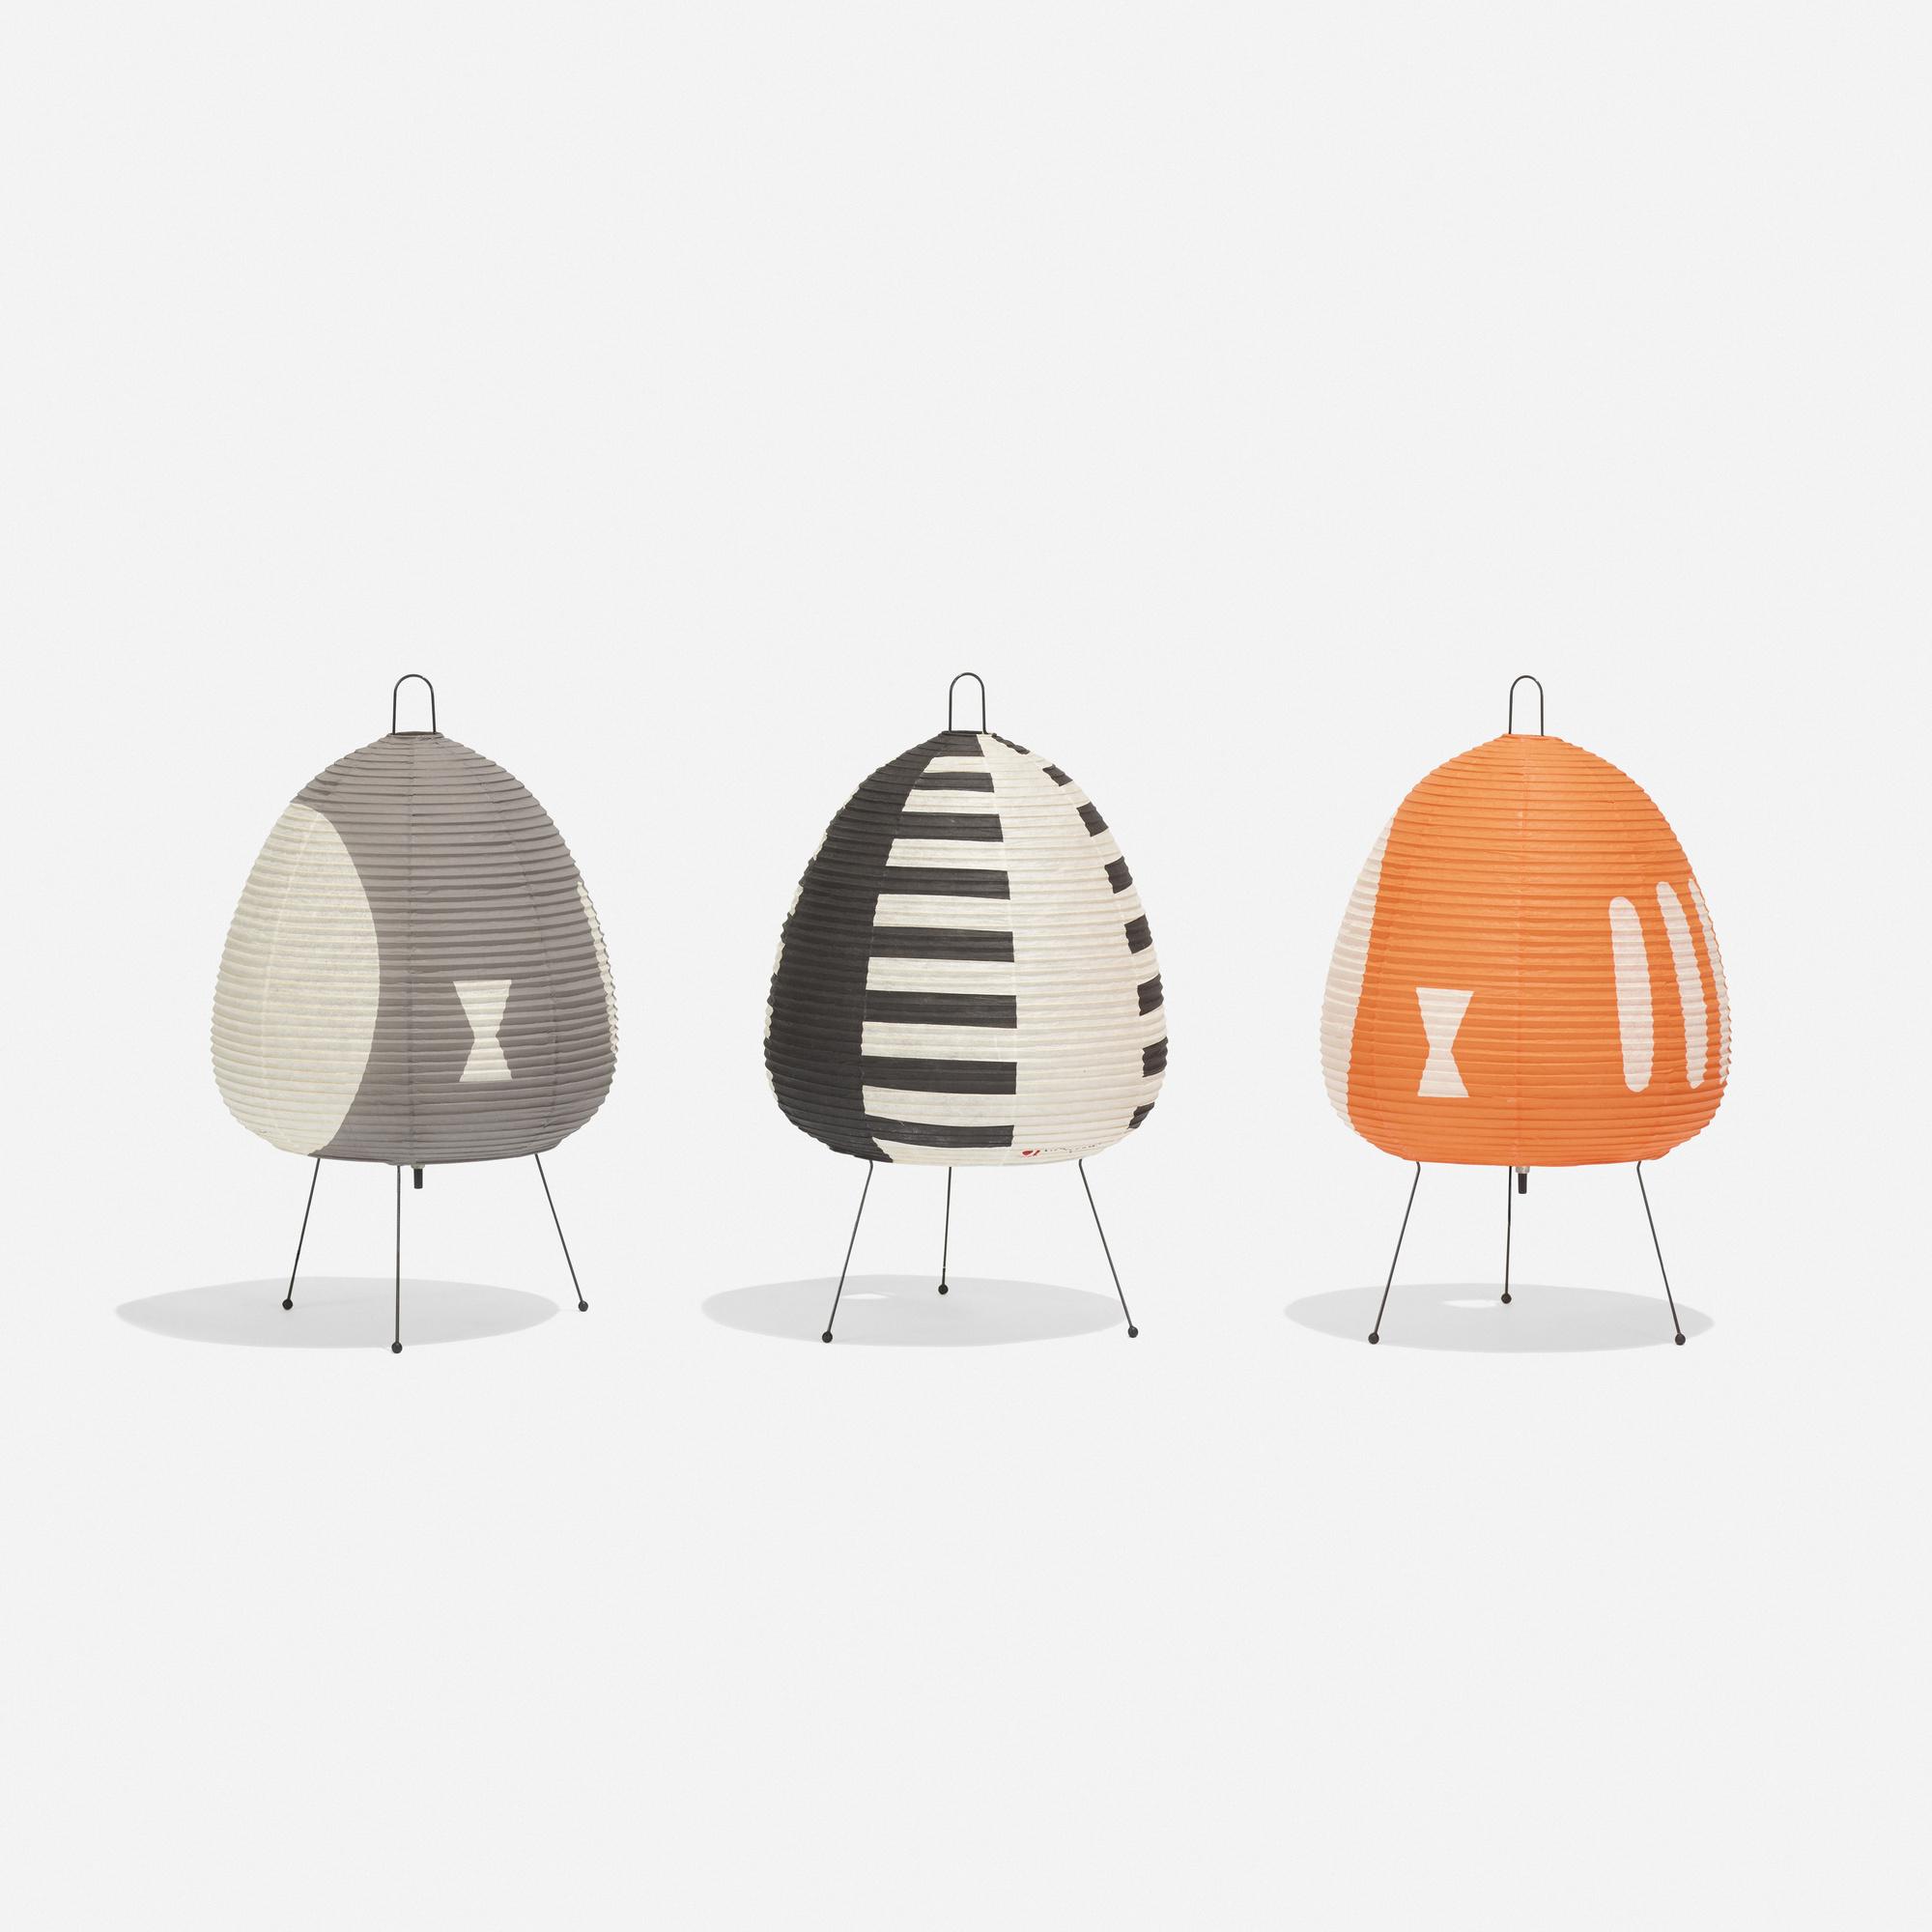 199: ISAMU NOGUCHI, collection of three Akari lamps